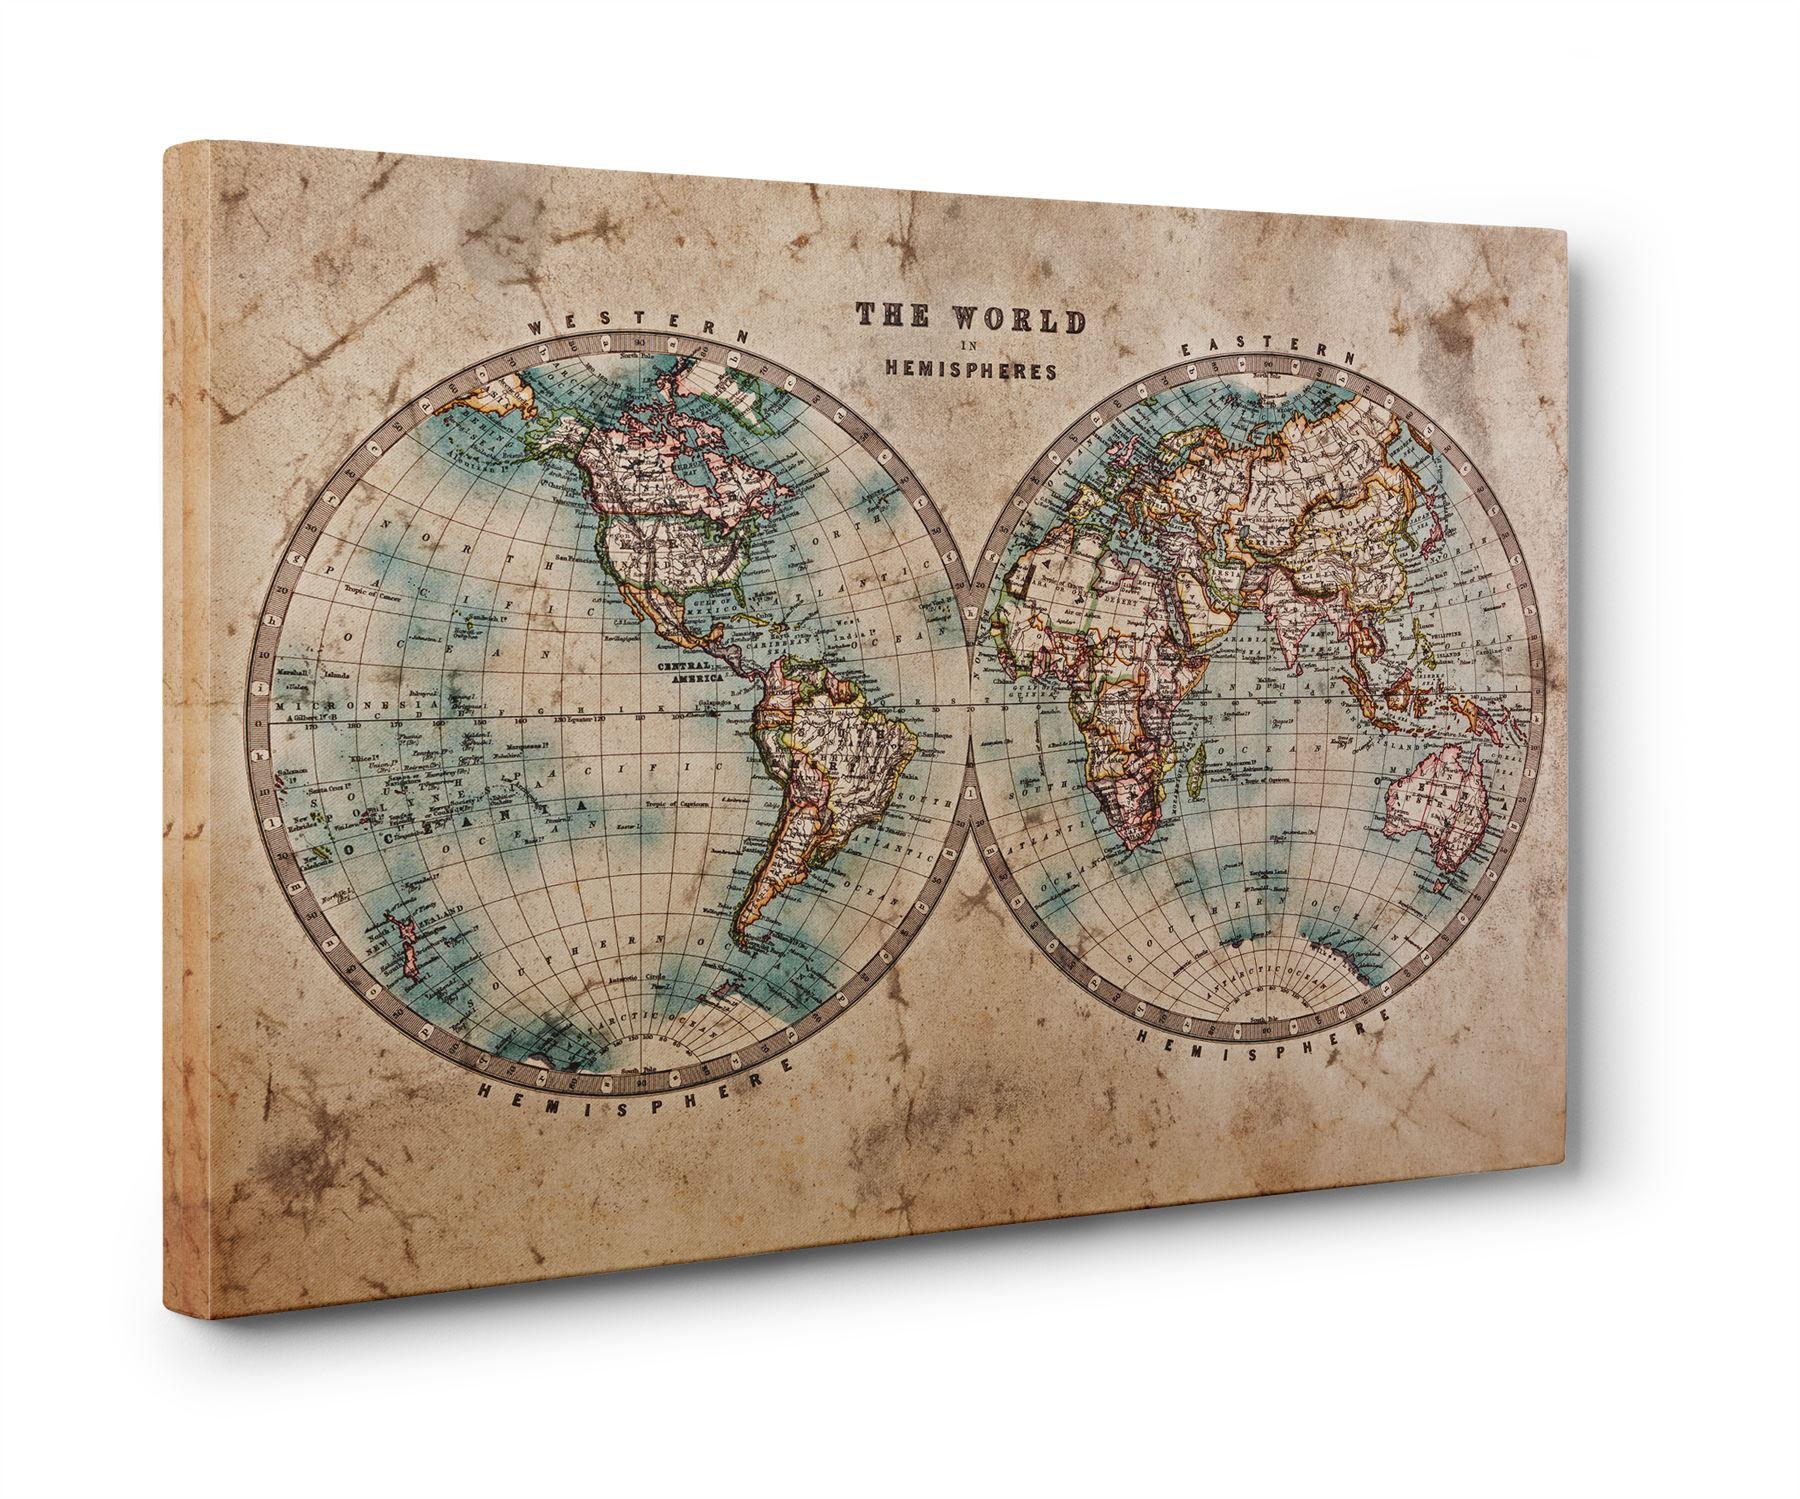 Vintage Map Of The World Hemispheres Box Canvas Print Wall Art - Antique map box